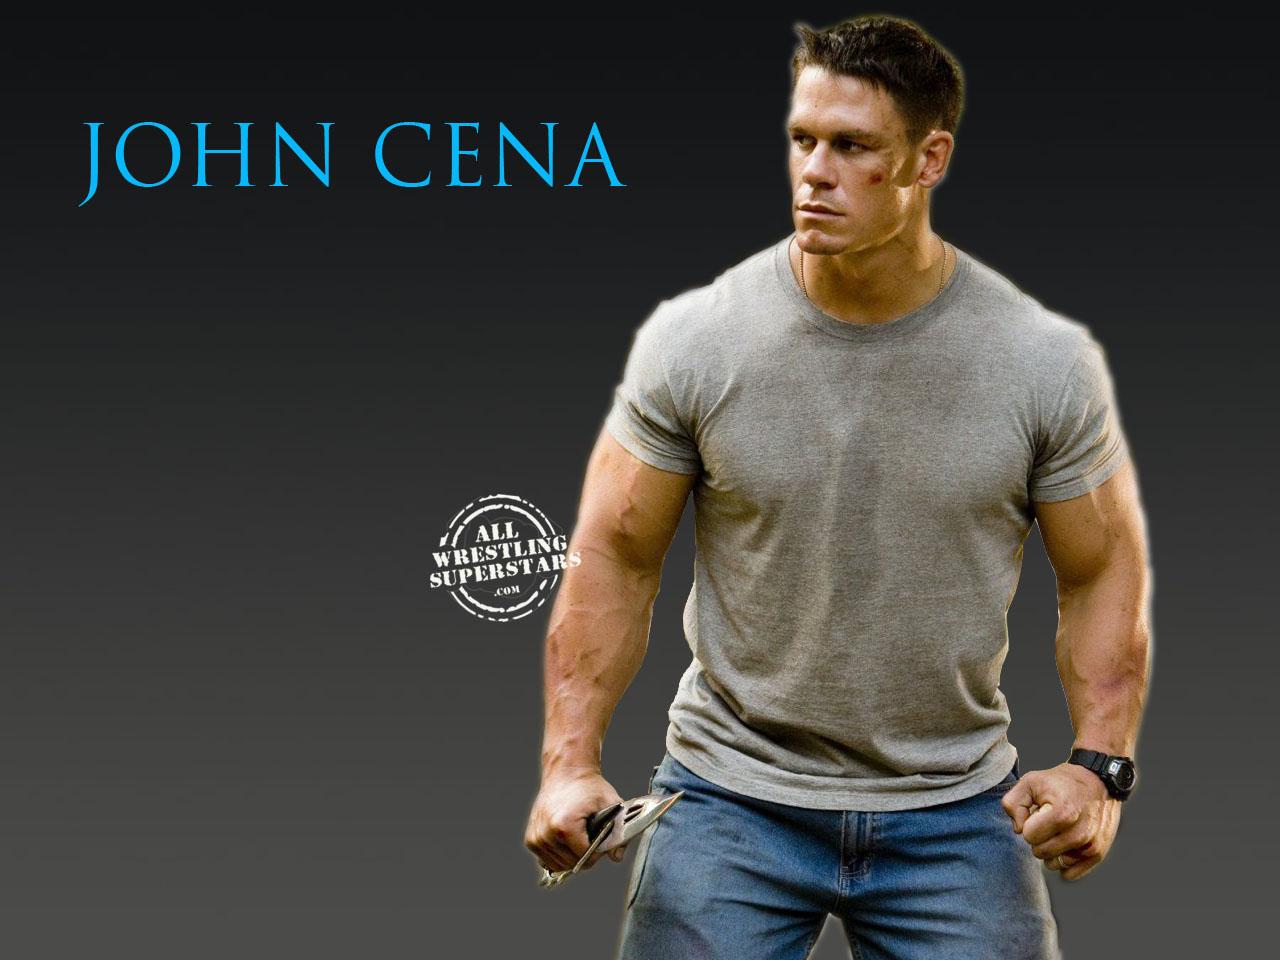 WWE CHAMPION 2011 wwe wallpapers john cena 1280x960